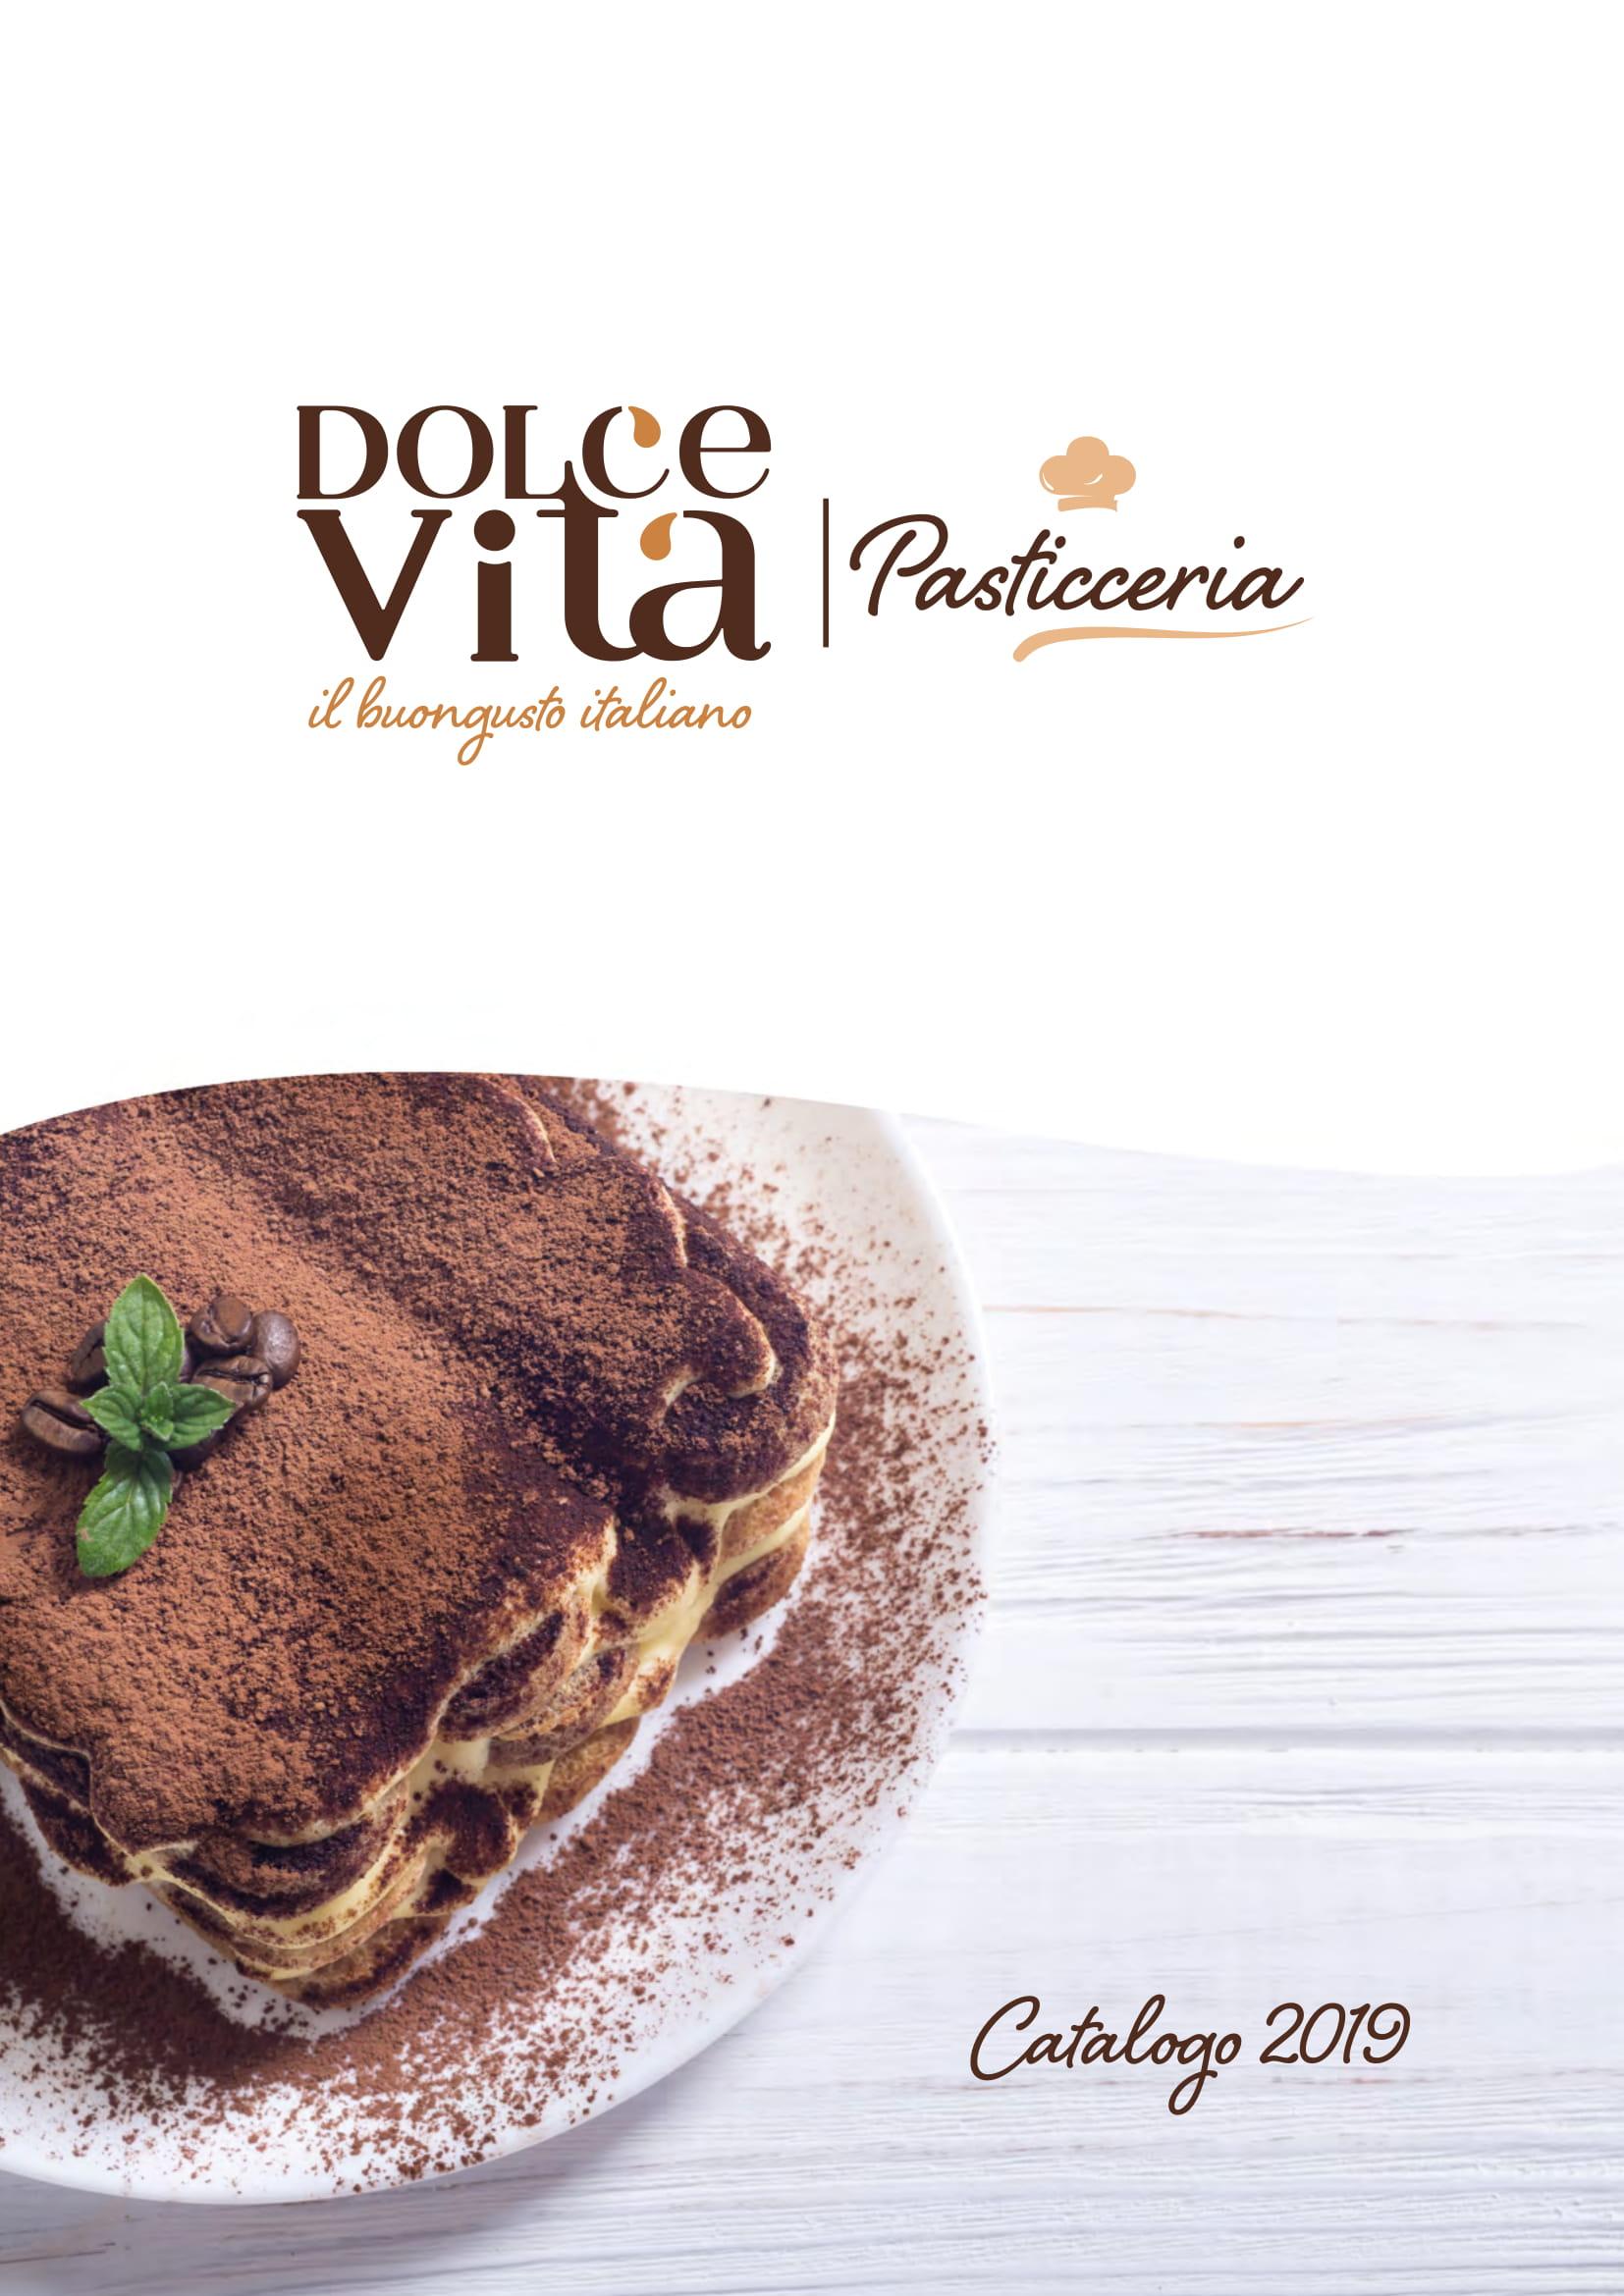 wholesale dealer d53a3 4936d La nuova pasticceria Dolcevita | Girolimetti